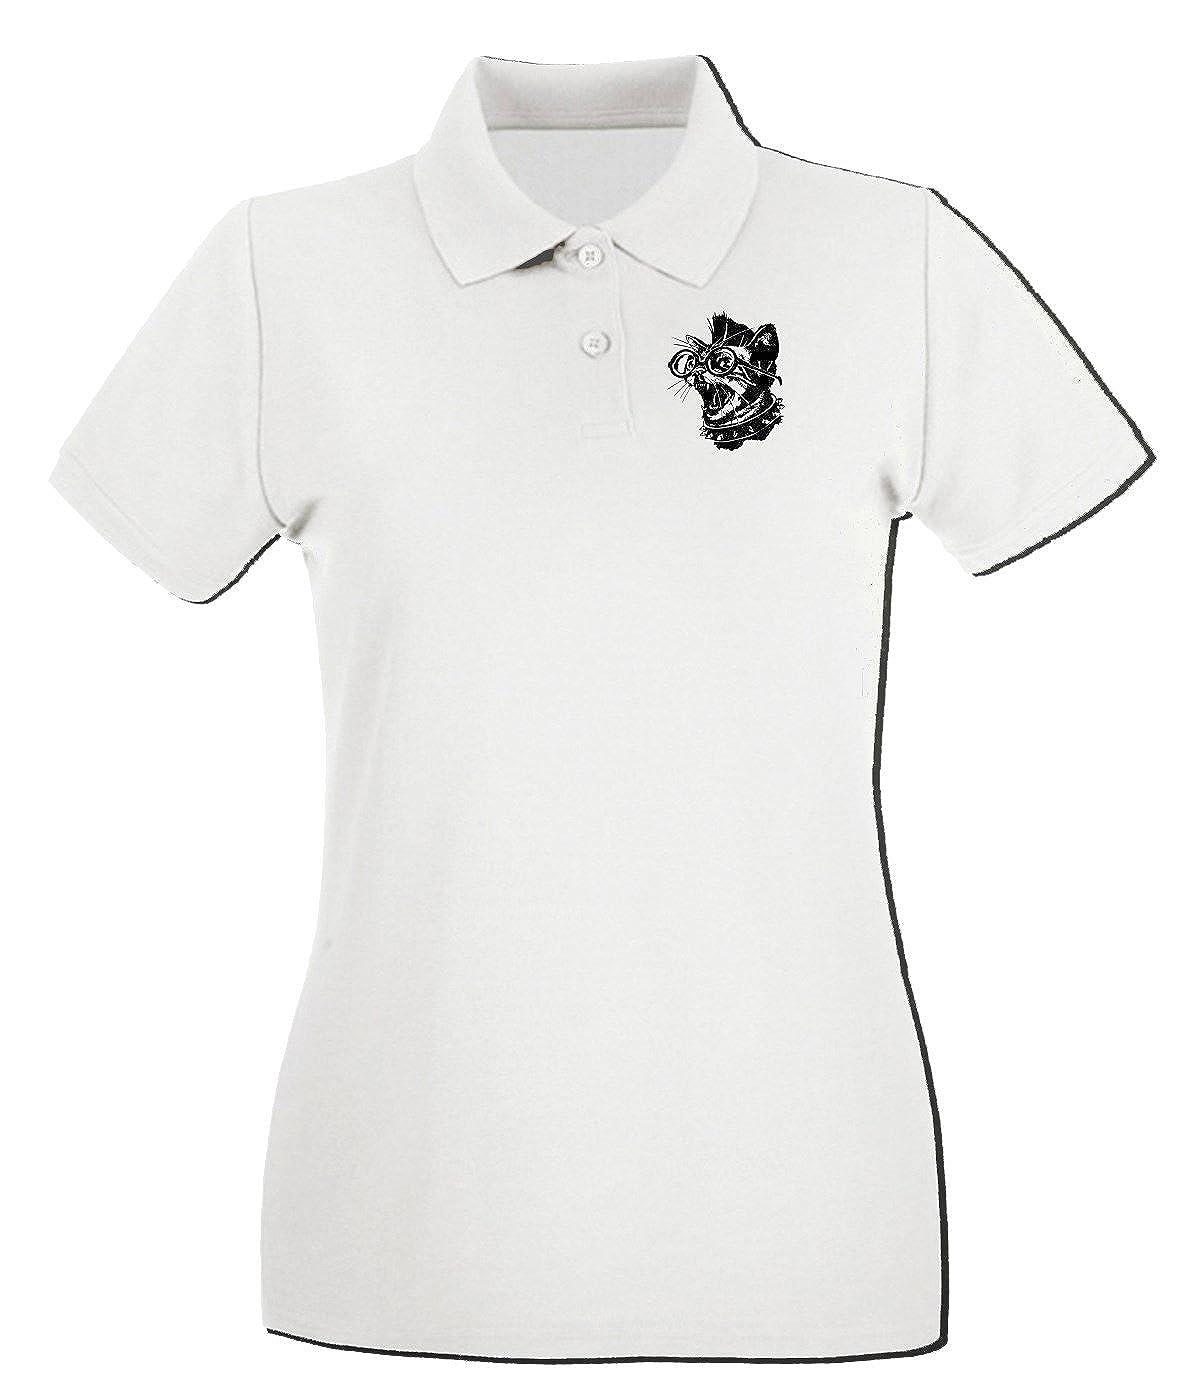 T-Shirtshock - Polo para mujer FUN0028 02 09 2014 Punk Cat T SHIRT ...